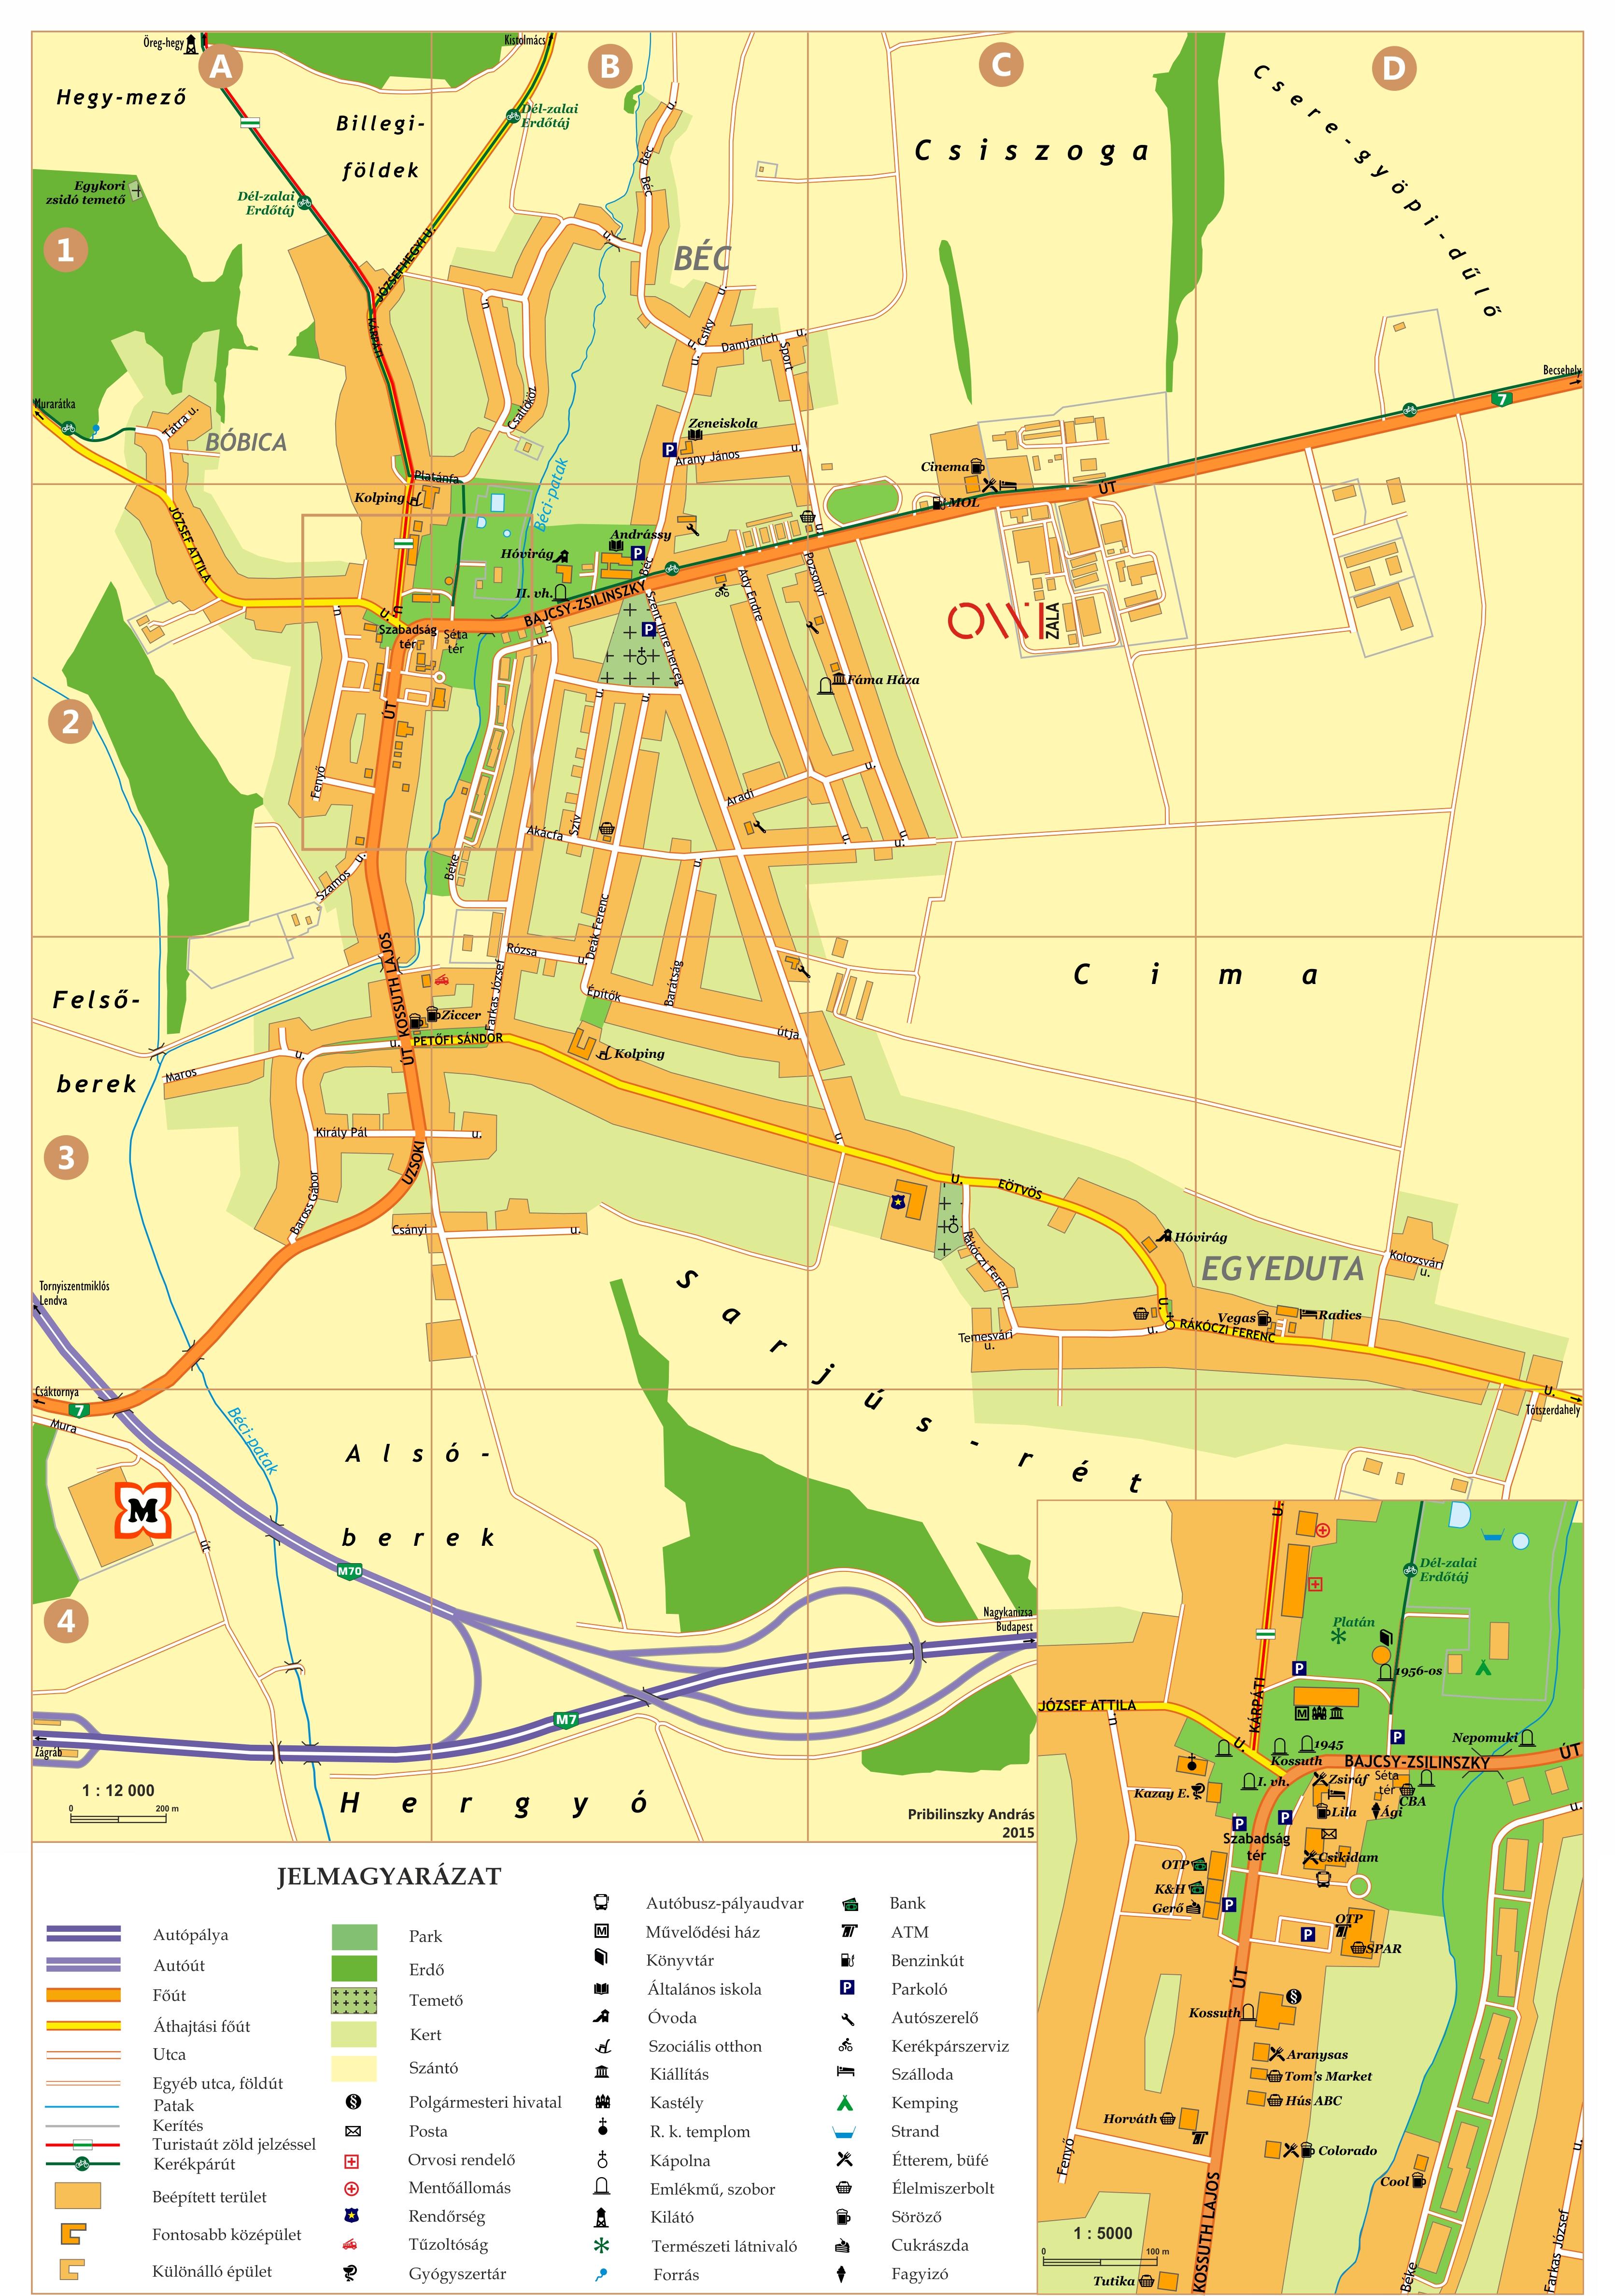 letenye térkép Letenye térképe letenye térkép